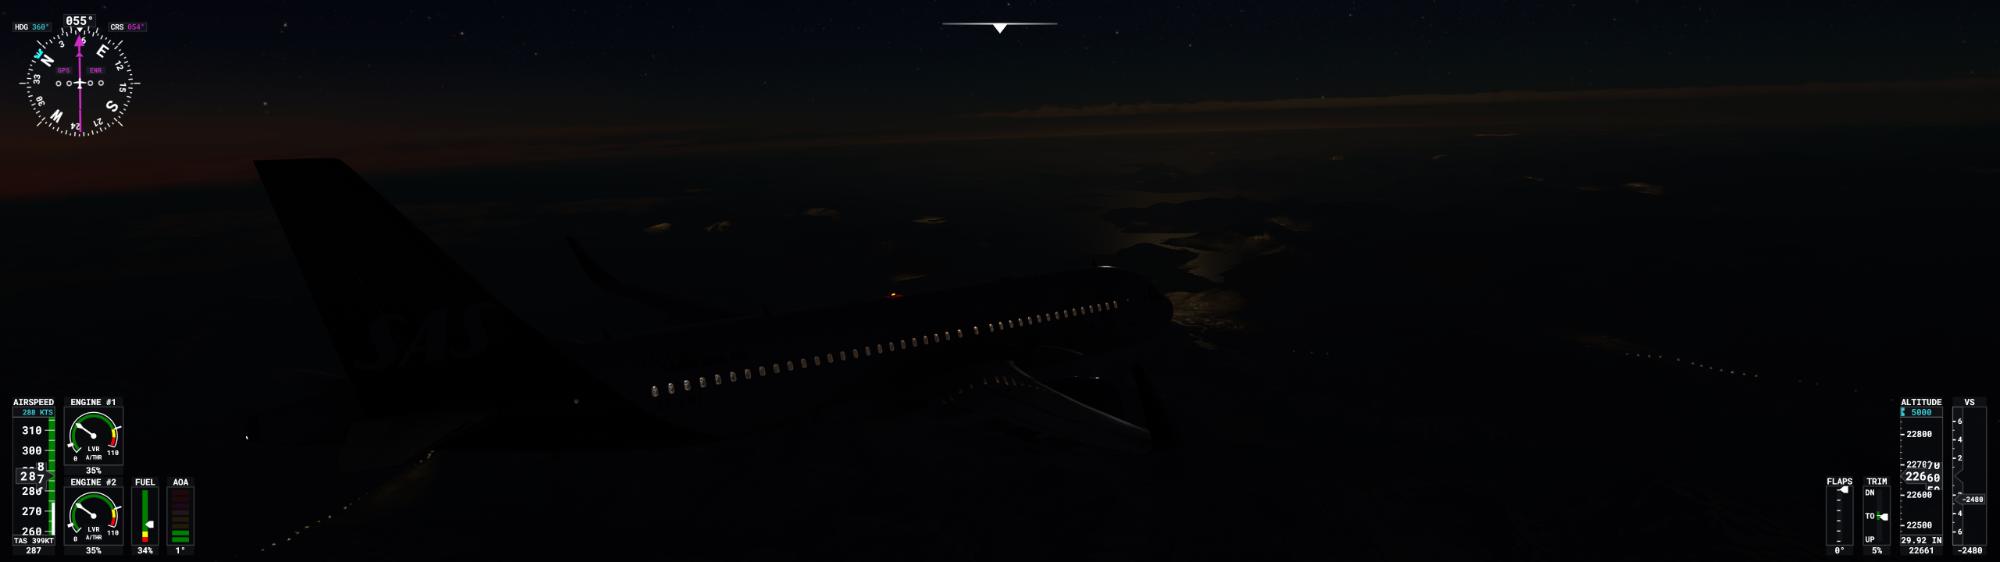 Microsoft Flight Simulator 29.09.2021 20_53_27.png